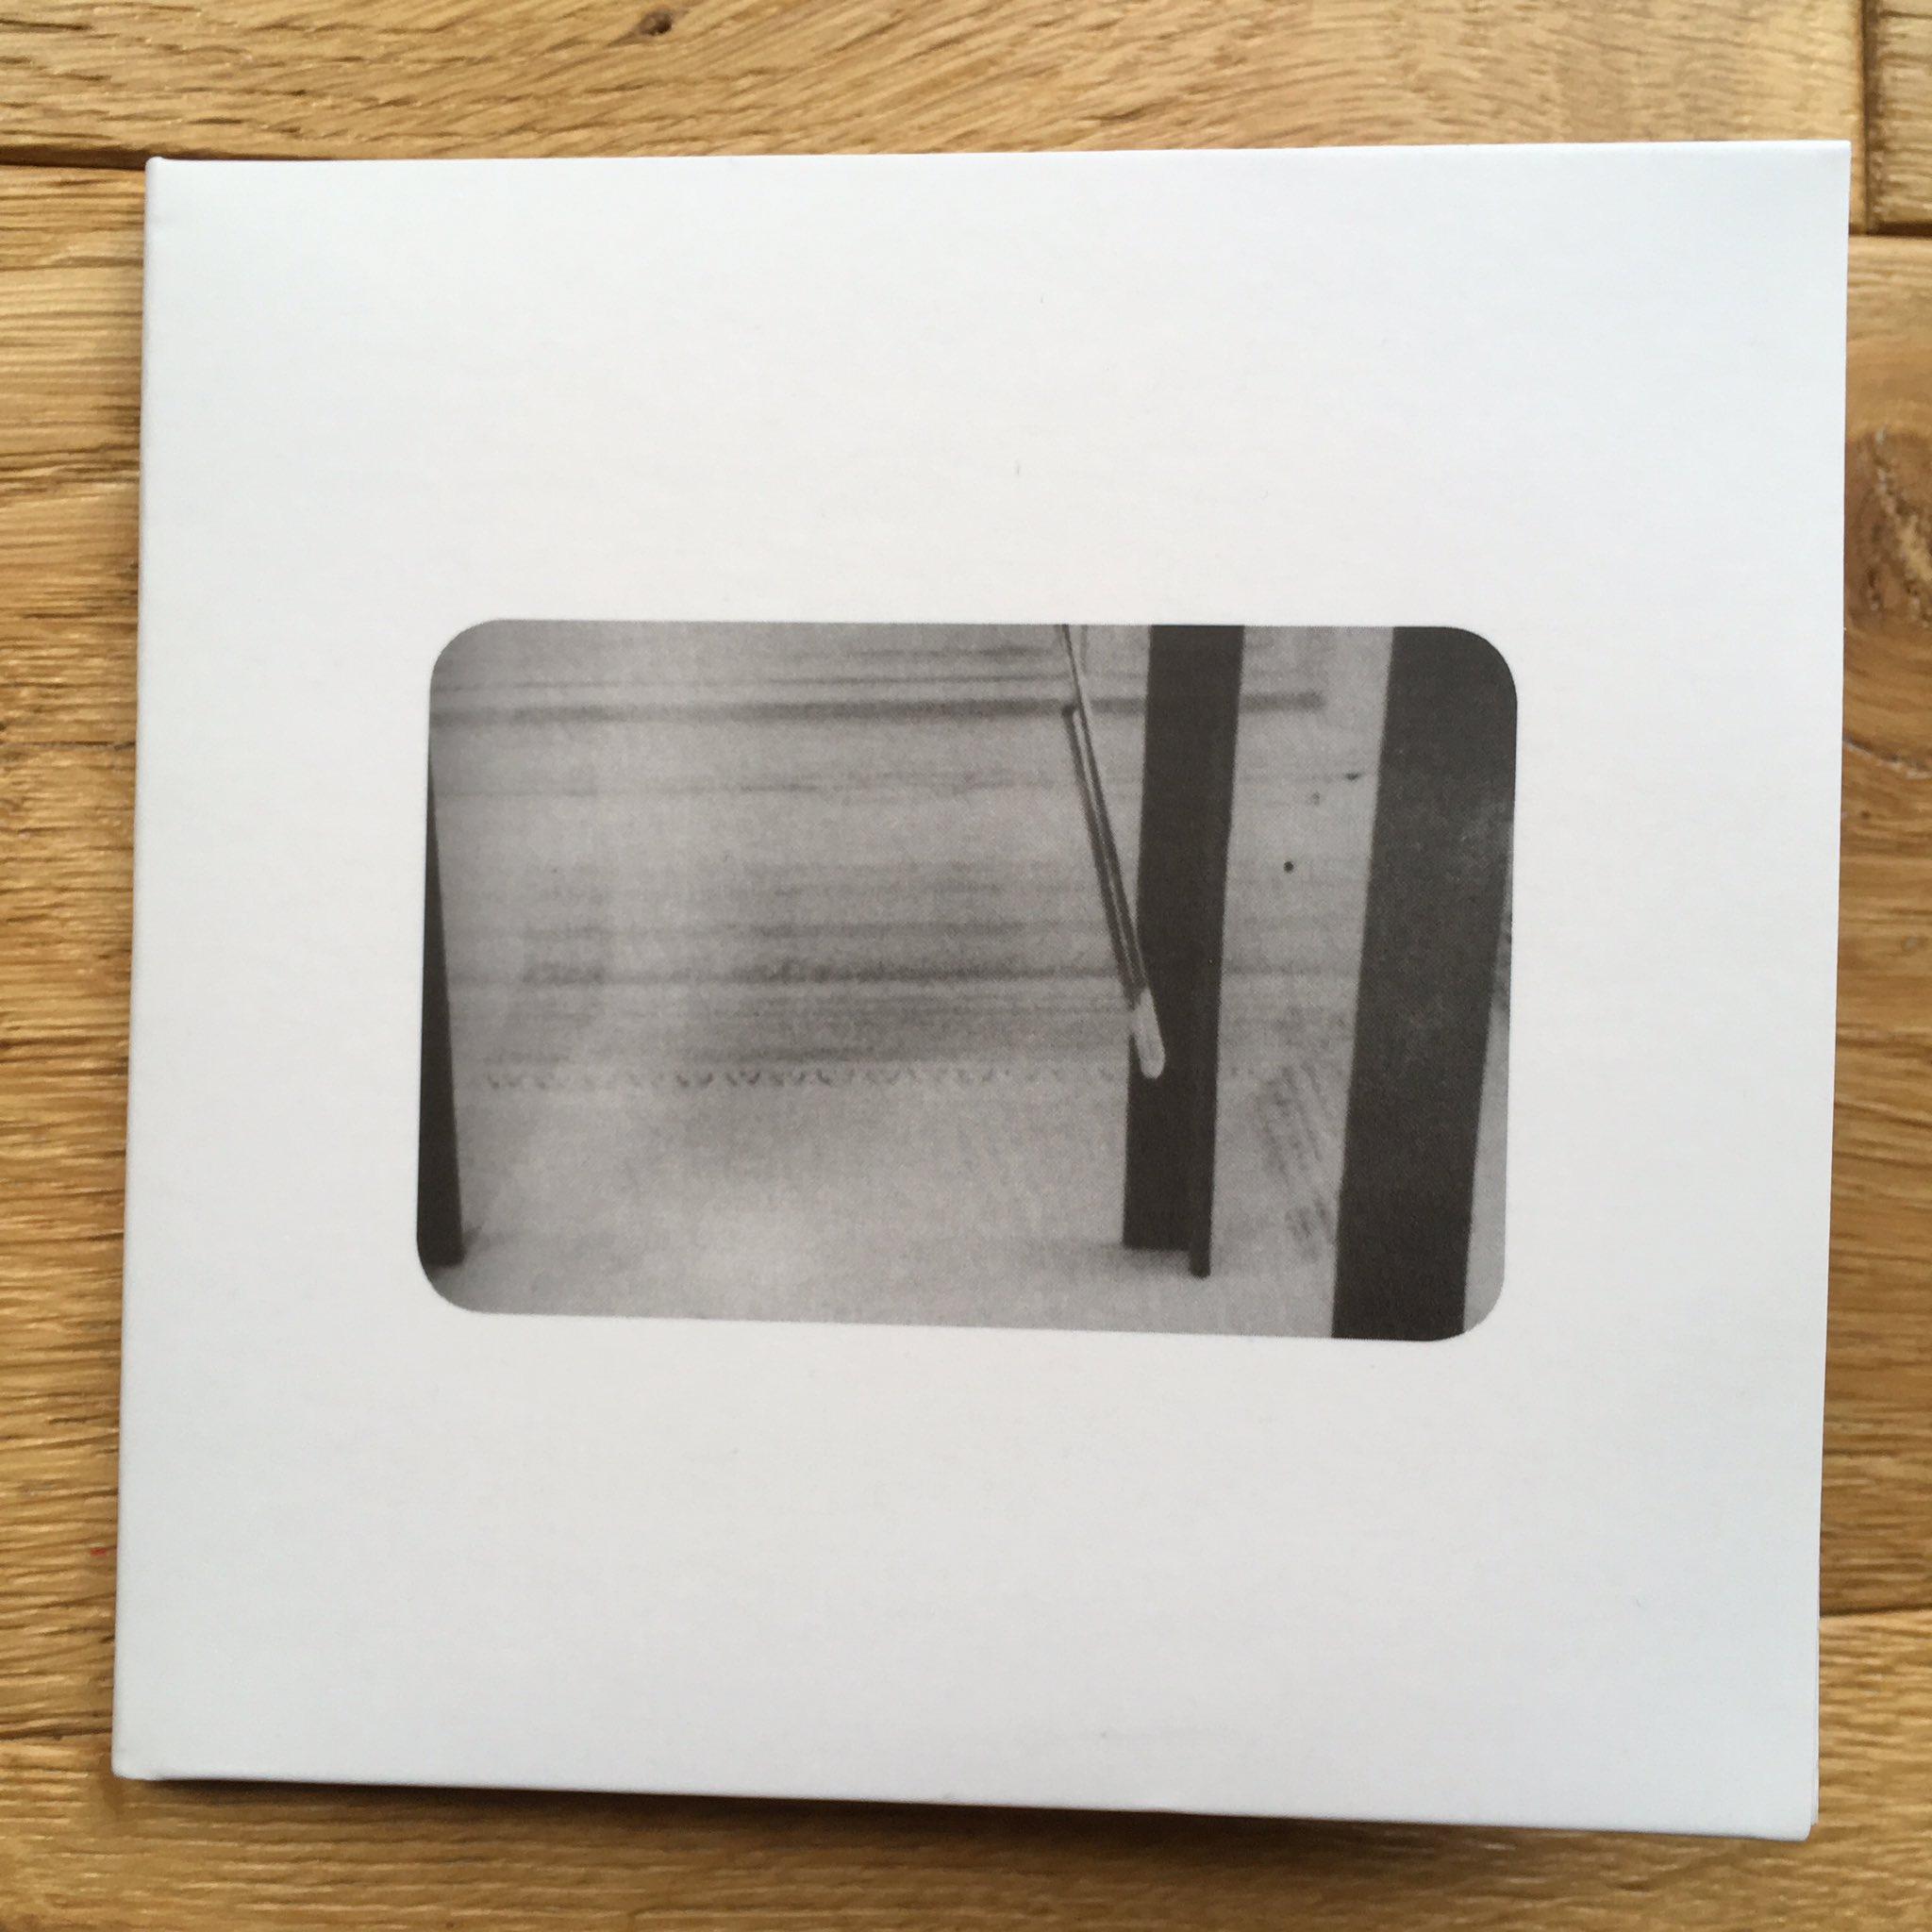 Sunday listening 2, Umwälzung. My first pass at the music of Henning Christiansen https://t.co/ax0mOjHHLp